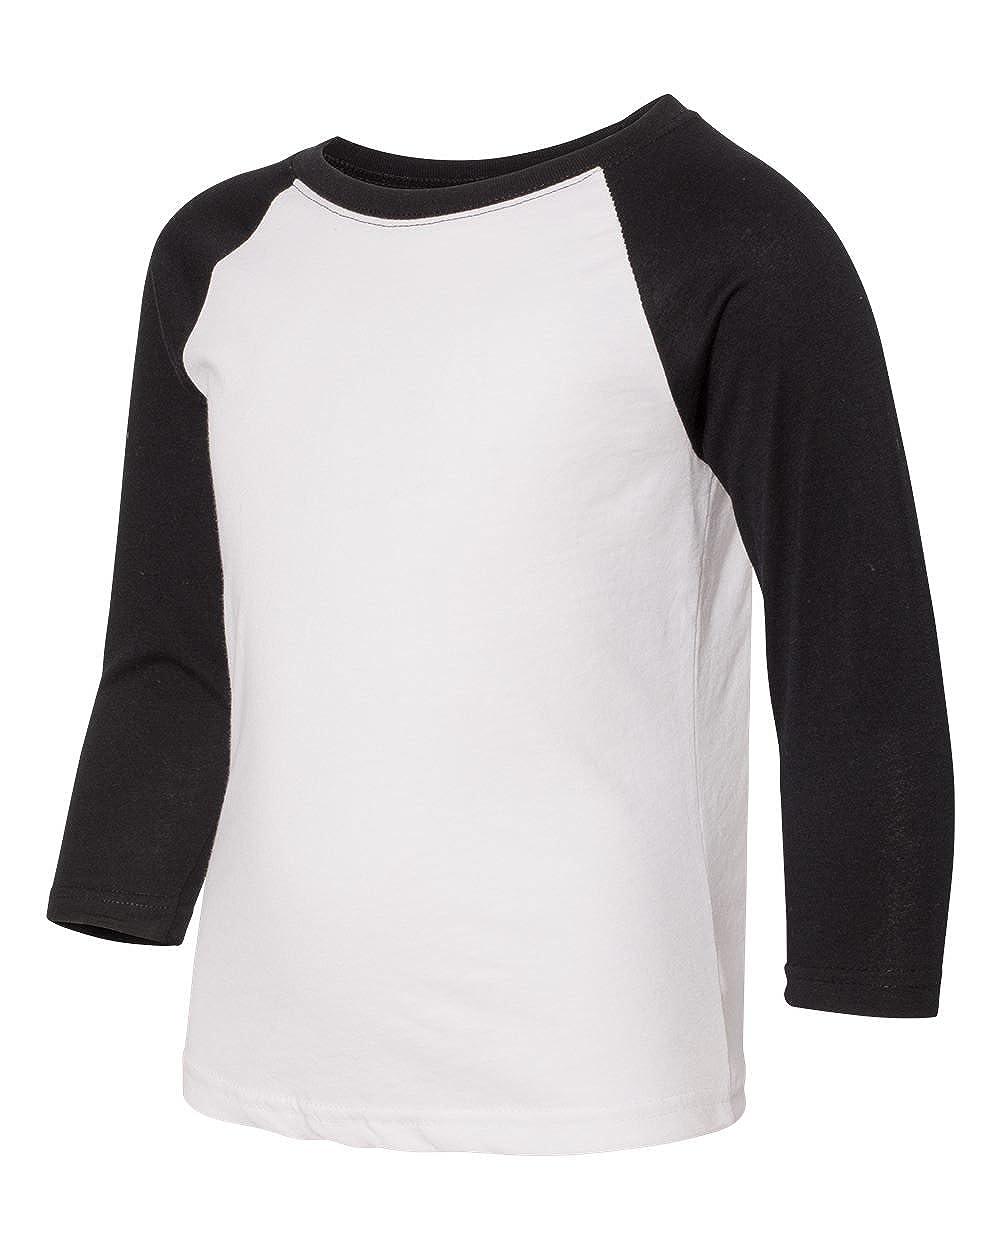 d7030c518732d7 Amazon.com  Next Level youth CVC 3 4-Sleeve Raglan Tee (3352)  Clothing